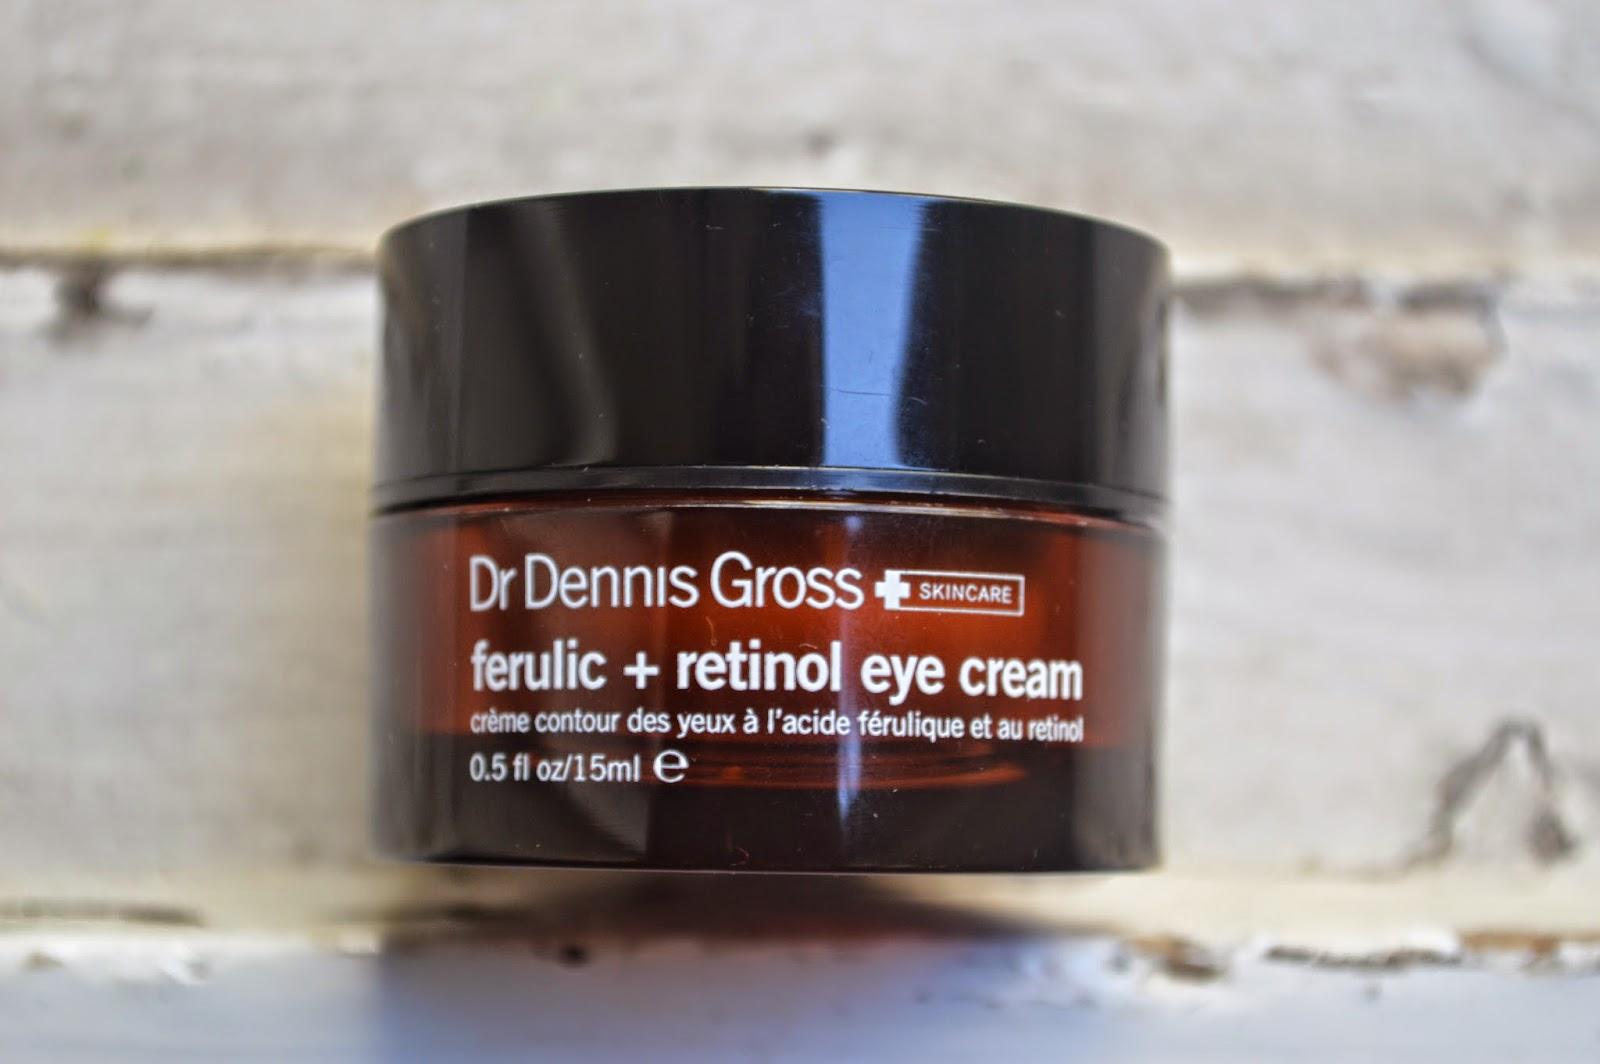 Dr Dennis Gross Ferulic Retinol Eye Cream Caroline Hirons